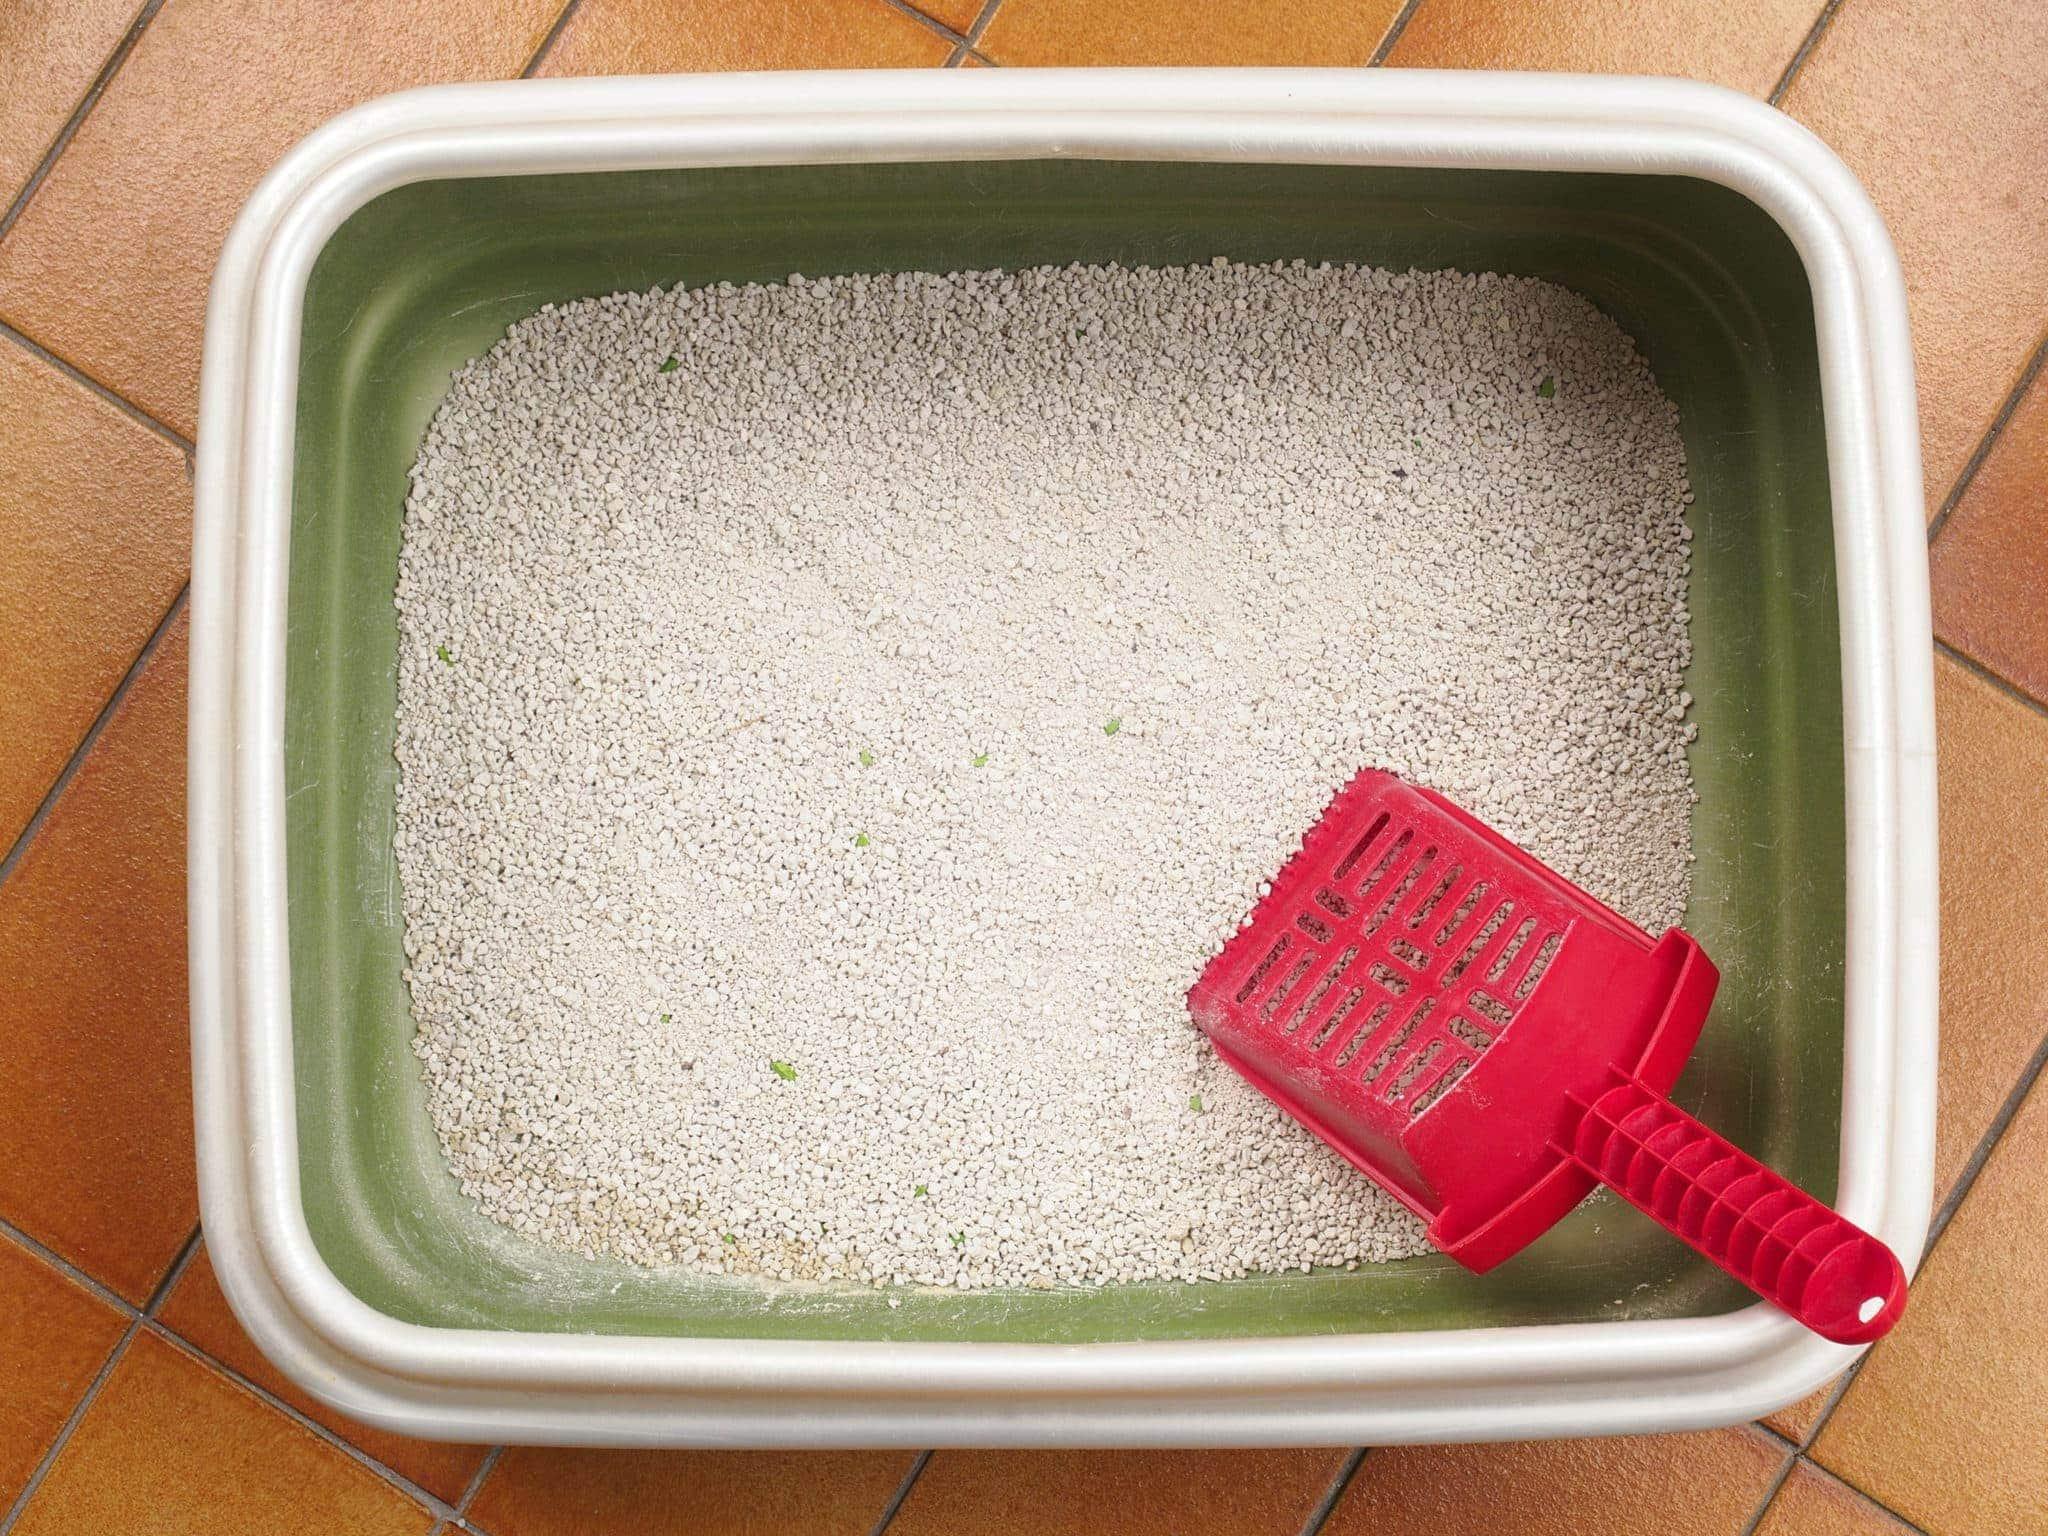 clean litter box_Enki Photo, Shutterstock